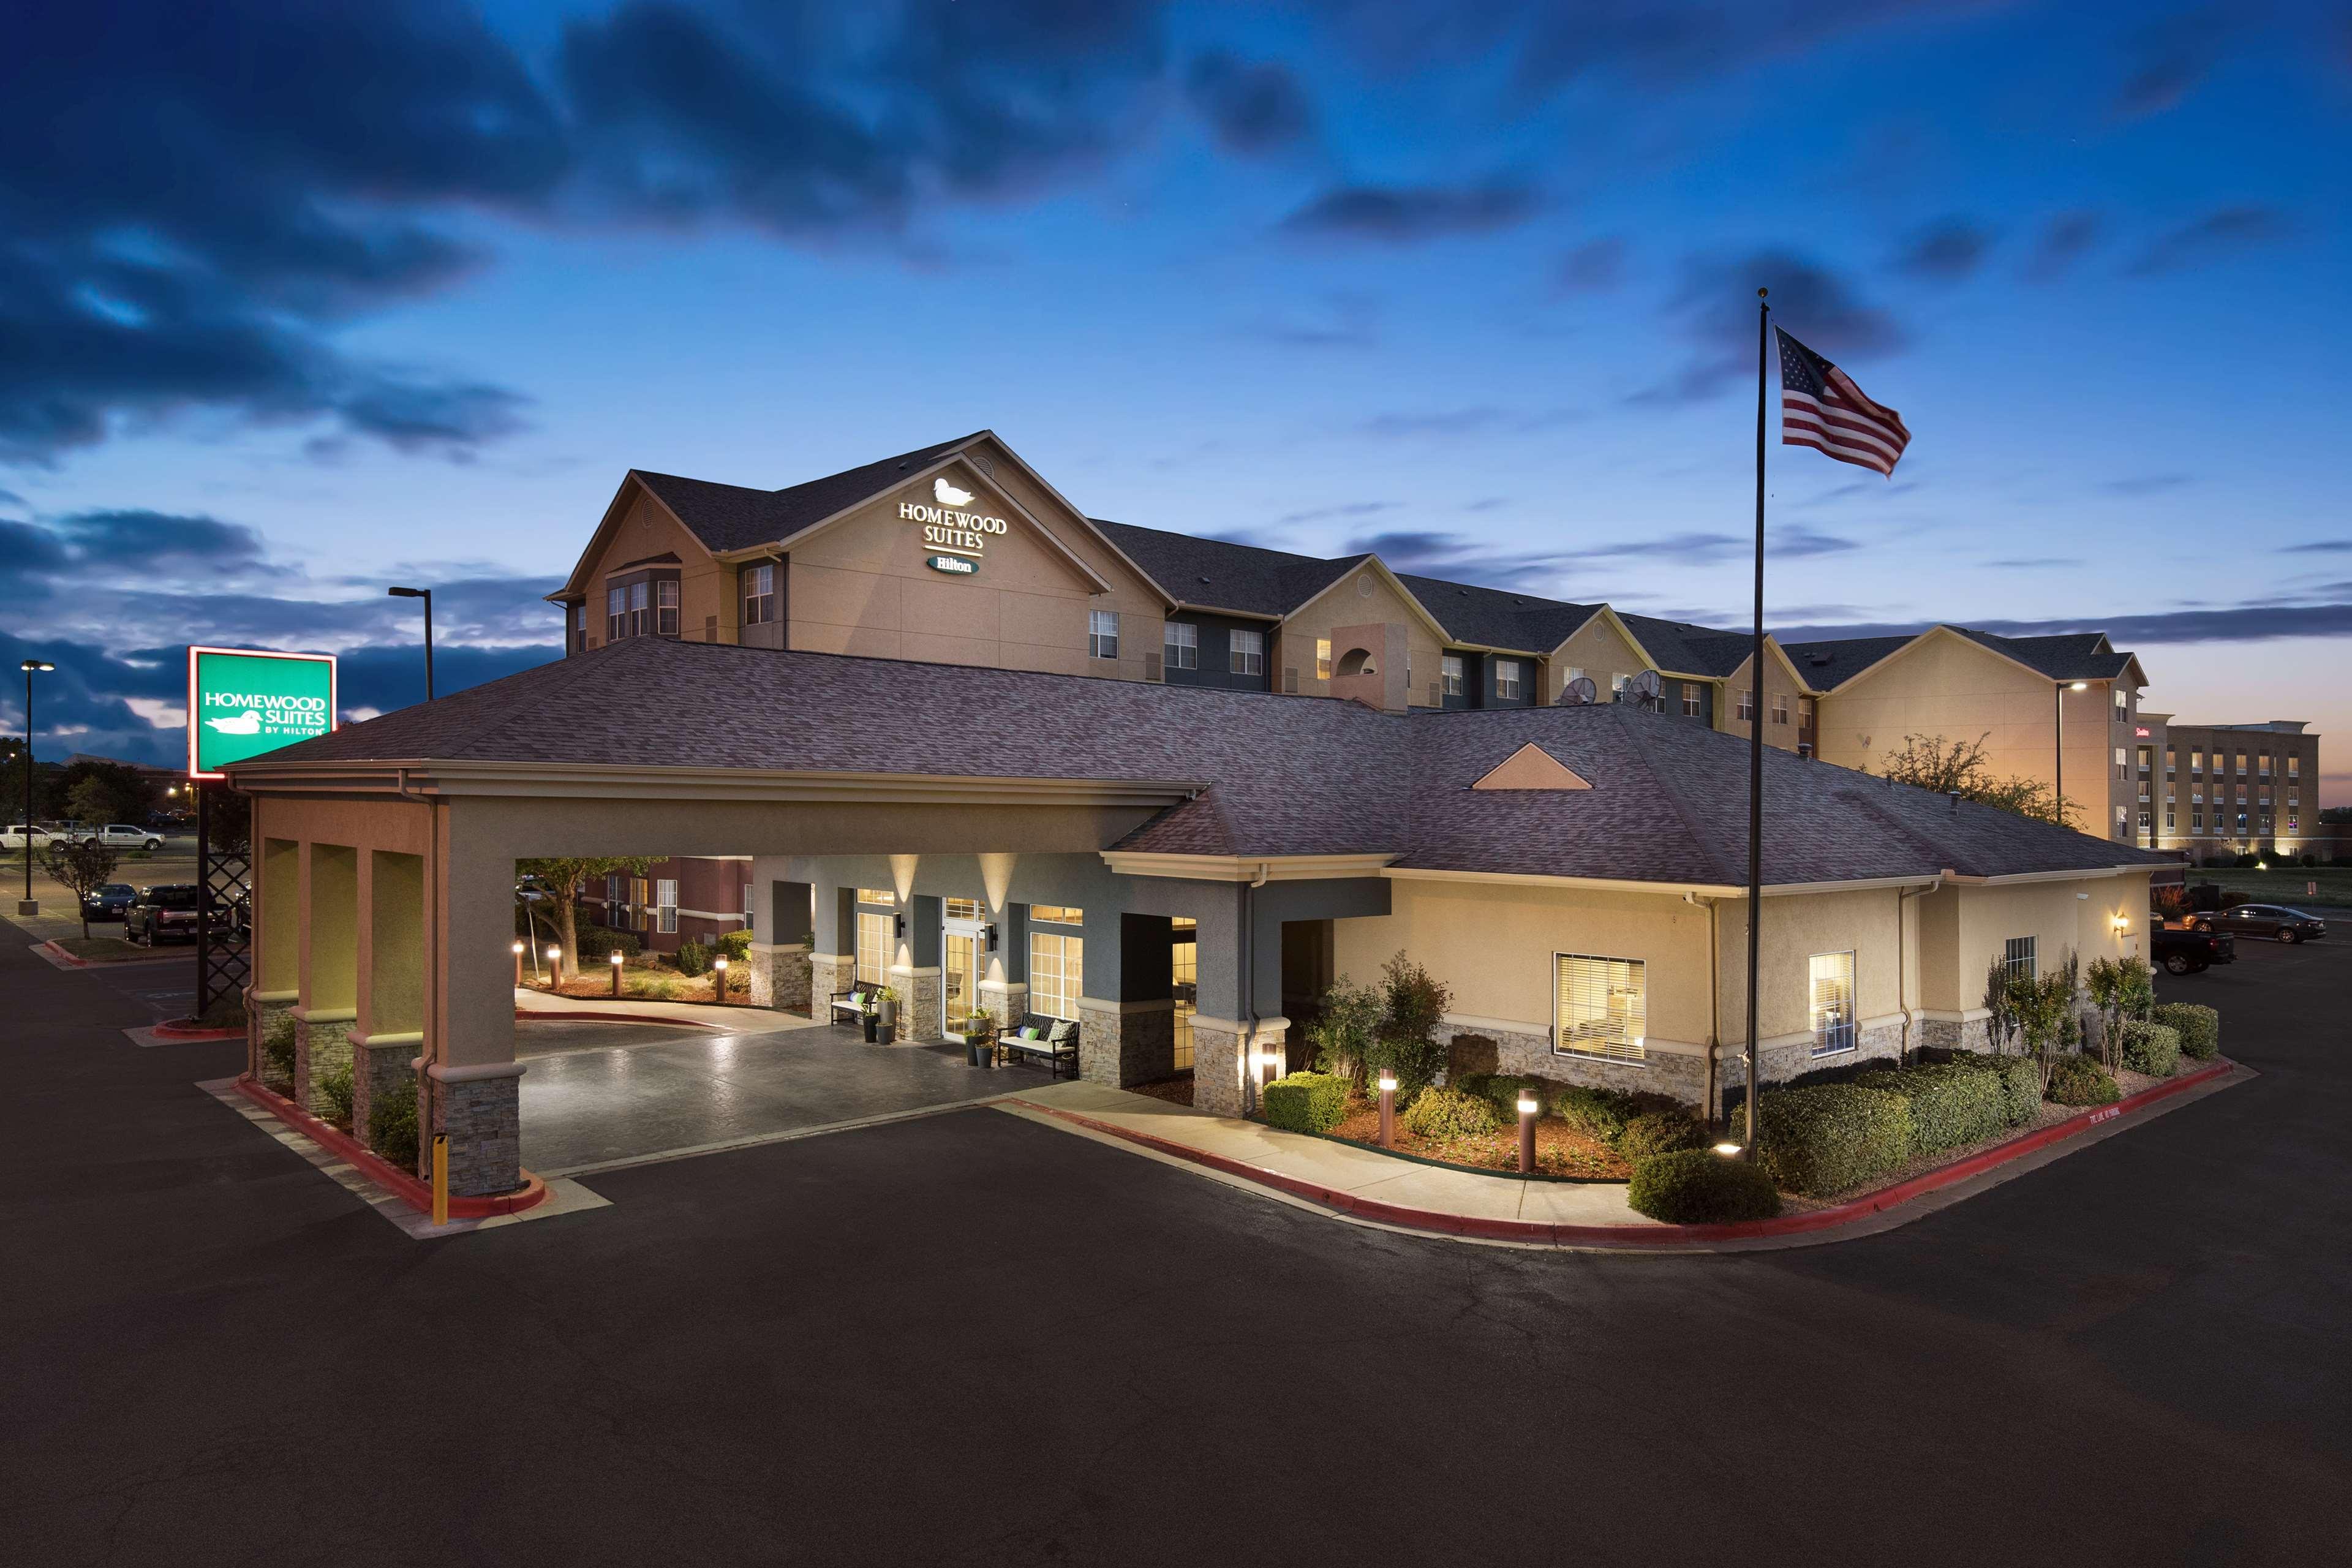 Homewood Suites by Hilton Lubbock image 2